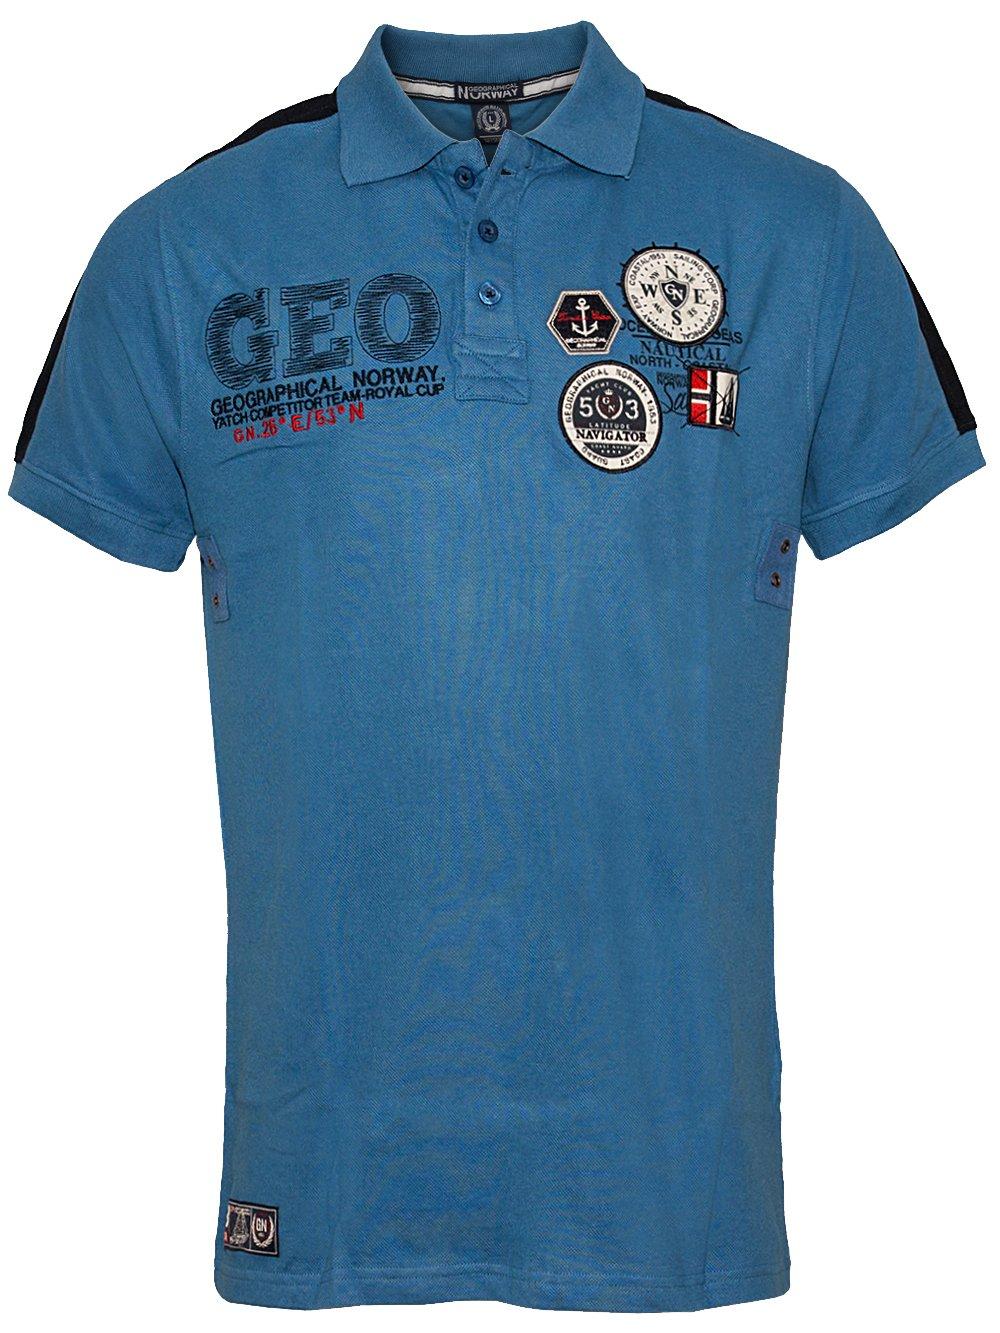 42787457c40b15 Herren Poloshirt Katal (blau) - Geographical Norway 11759 ...